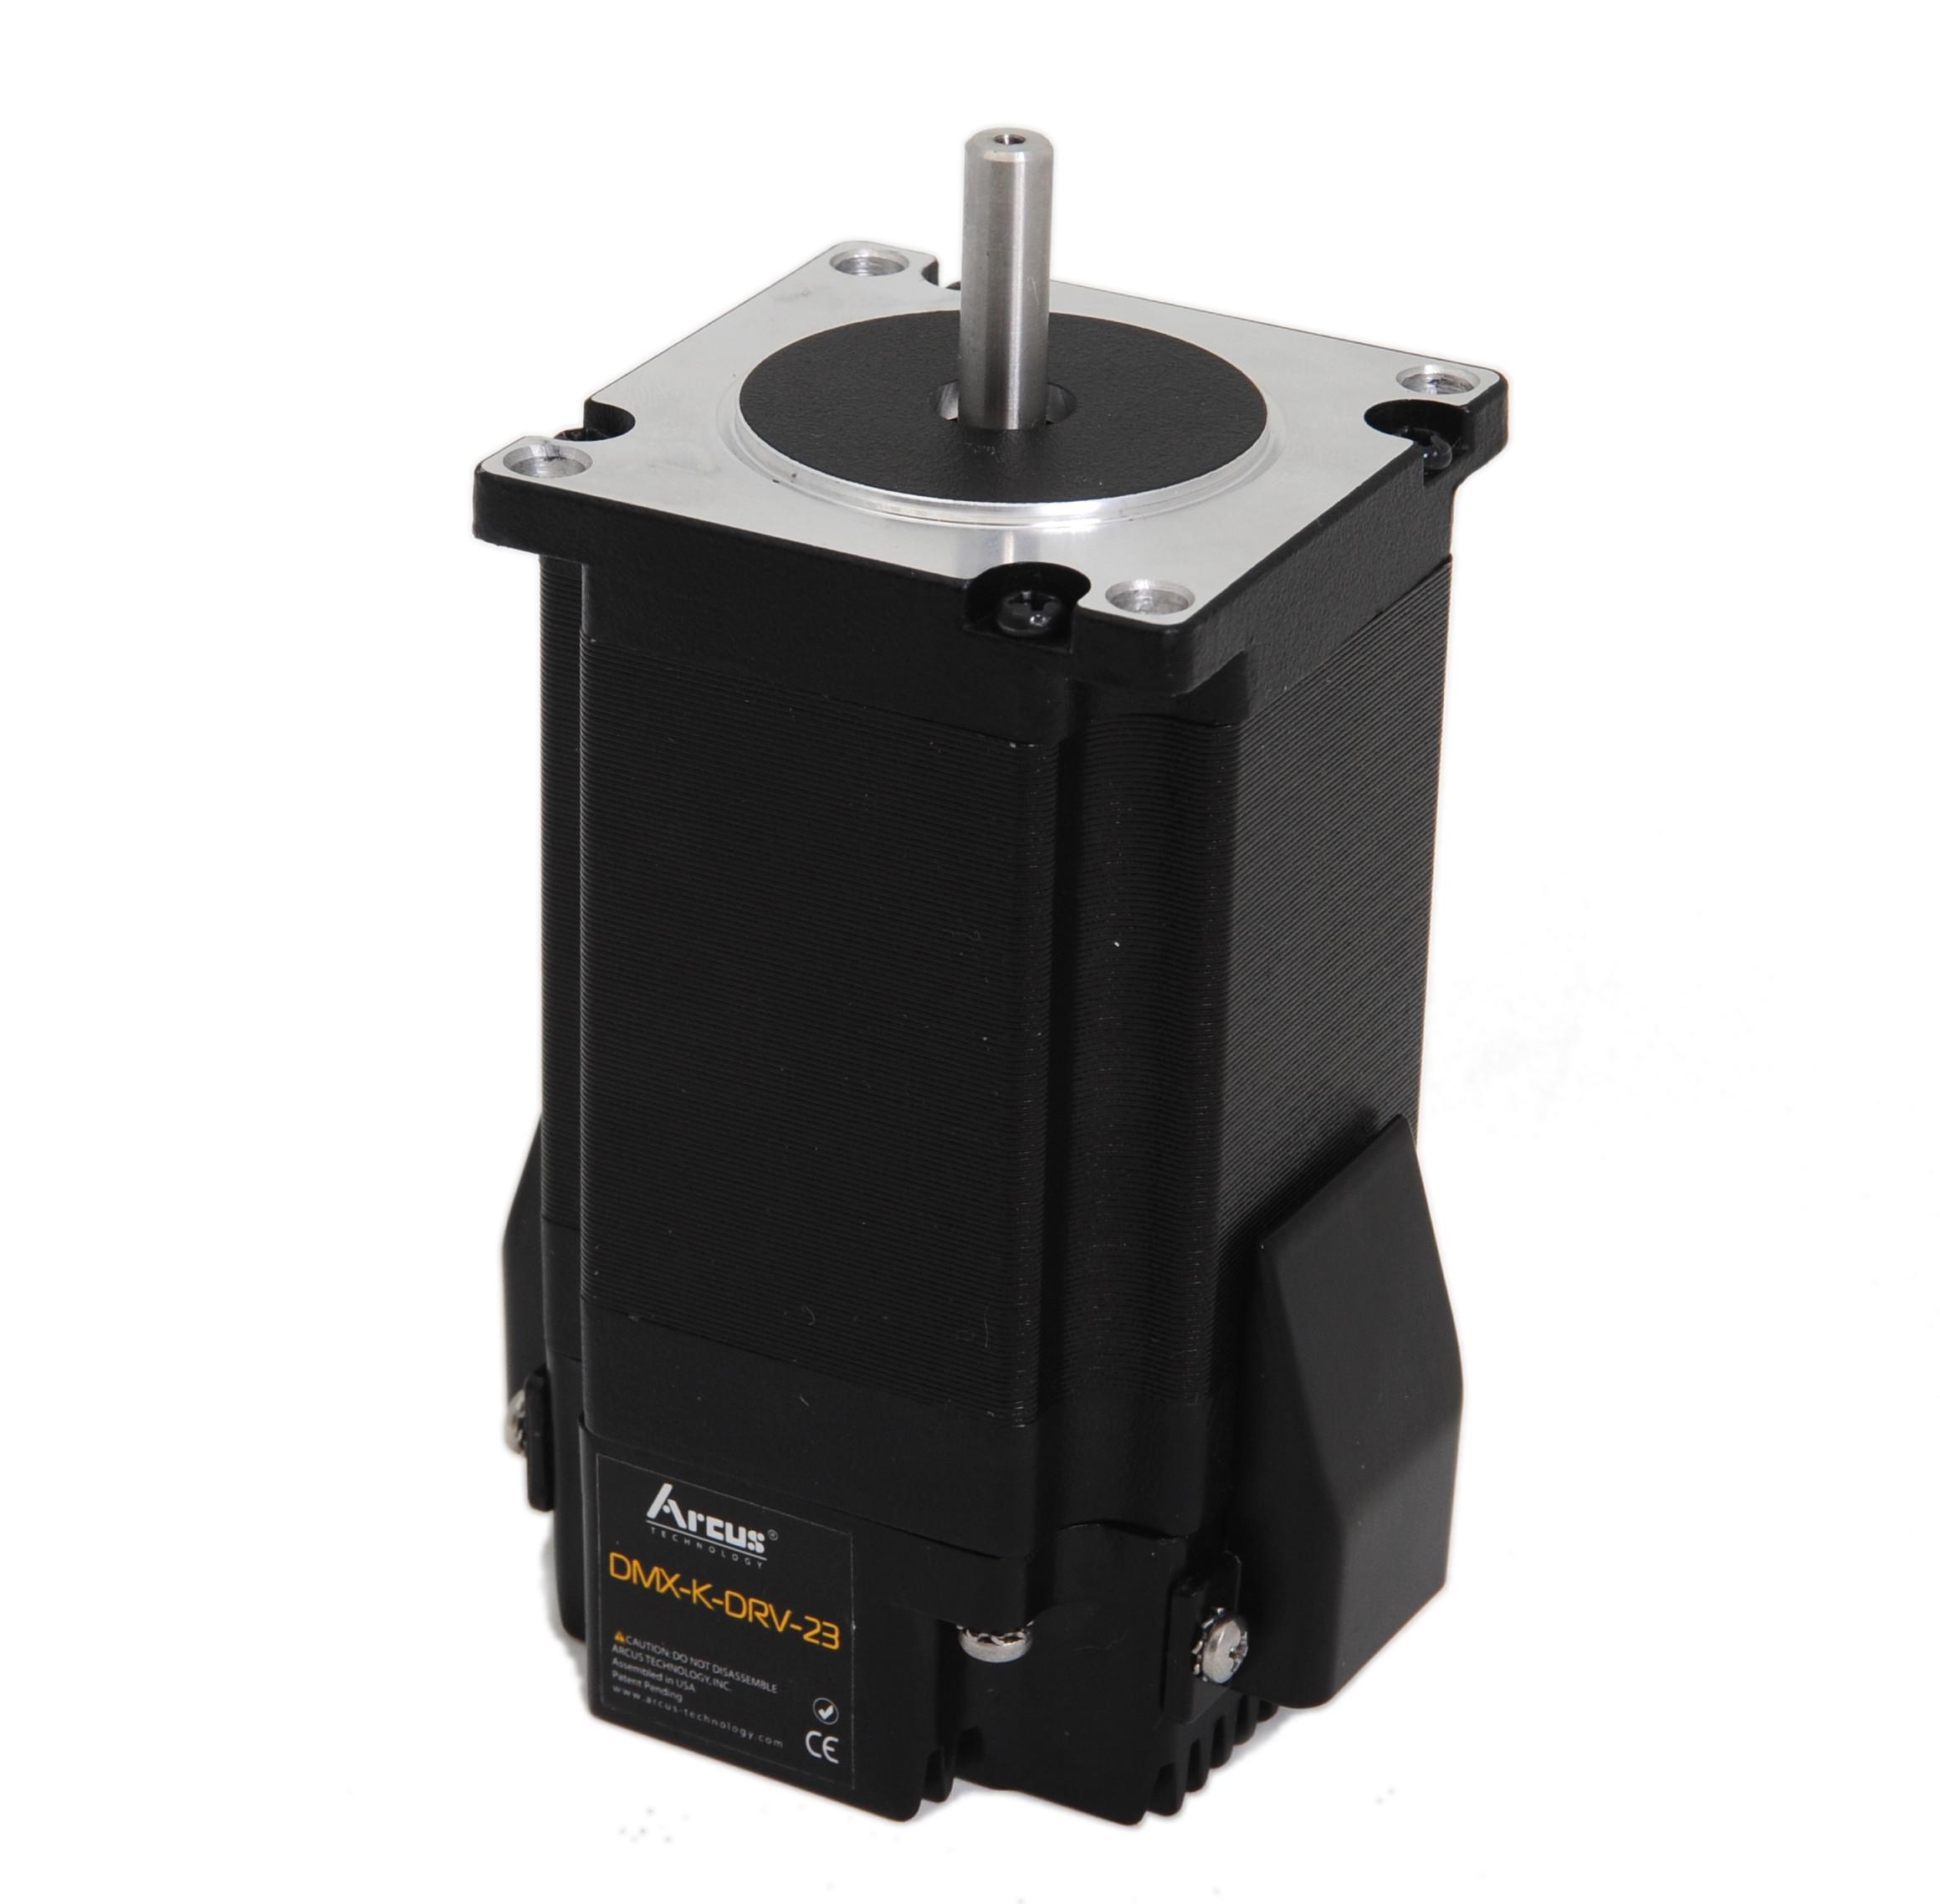 Nema 23 stepper driver arcus technology inc for Stepper motor integrated controller